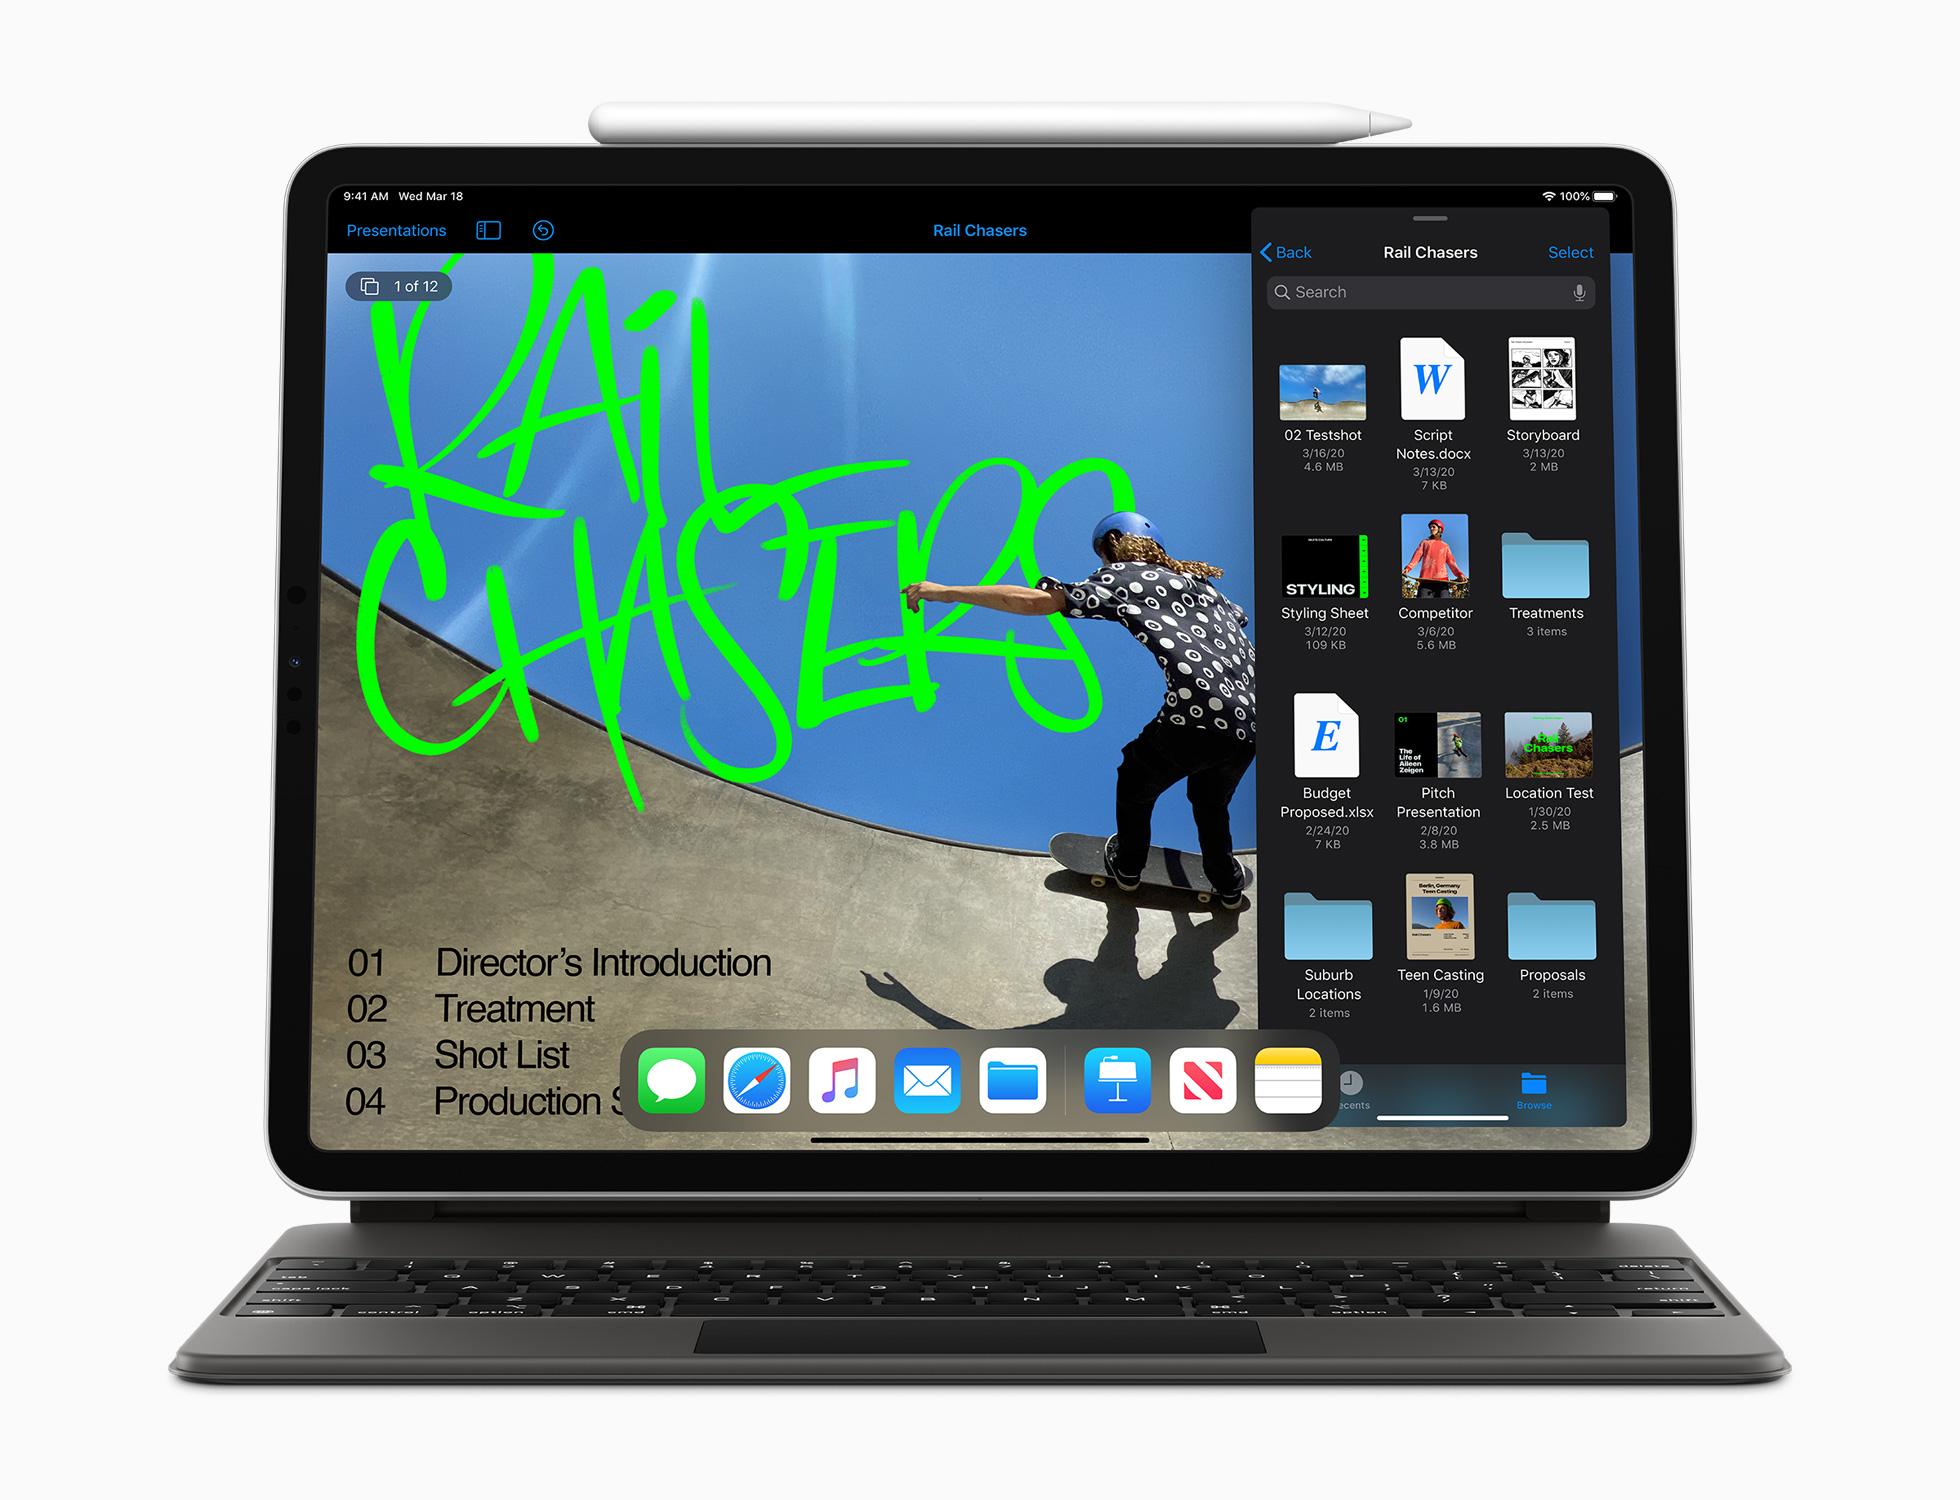 Apple_new-iPad-Pro-apple-pencil-and-smart-keyboard-folio_03182020_big.jpg.large_2x.jpg (1960×1500)